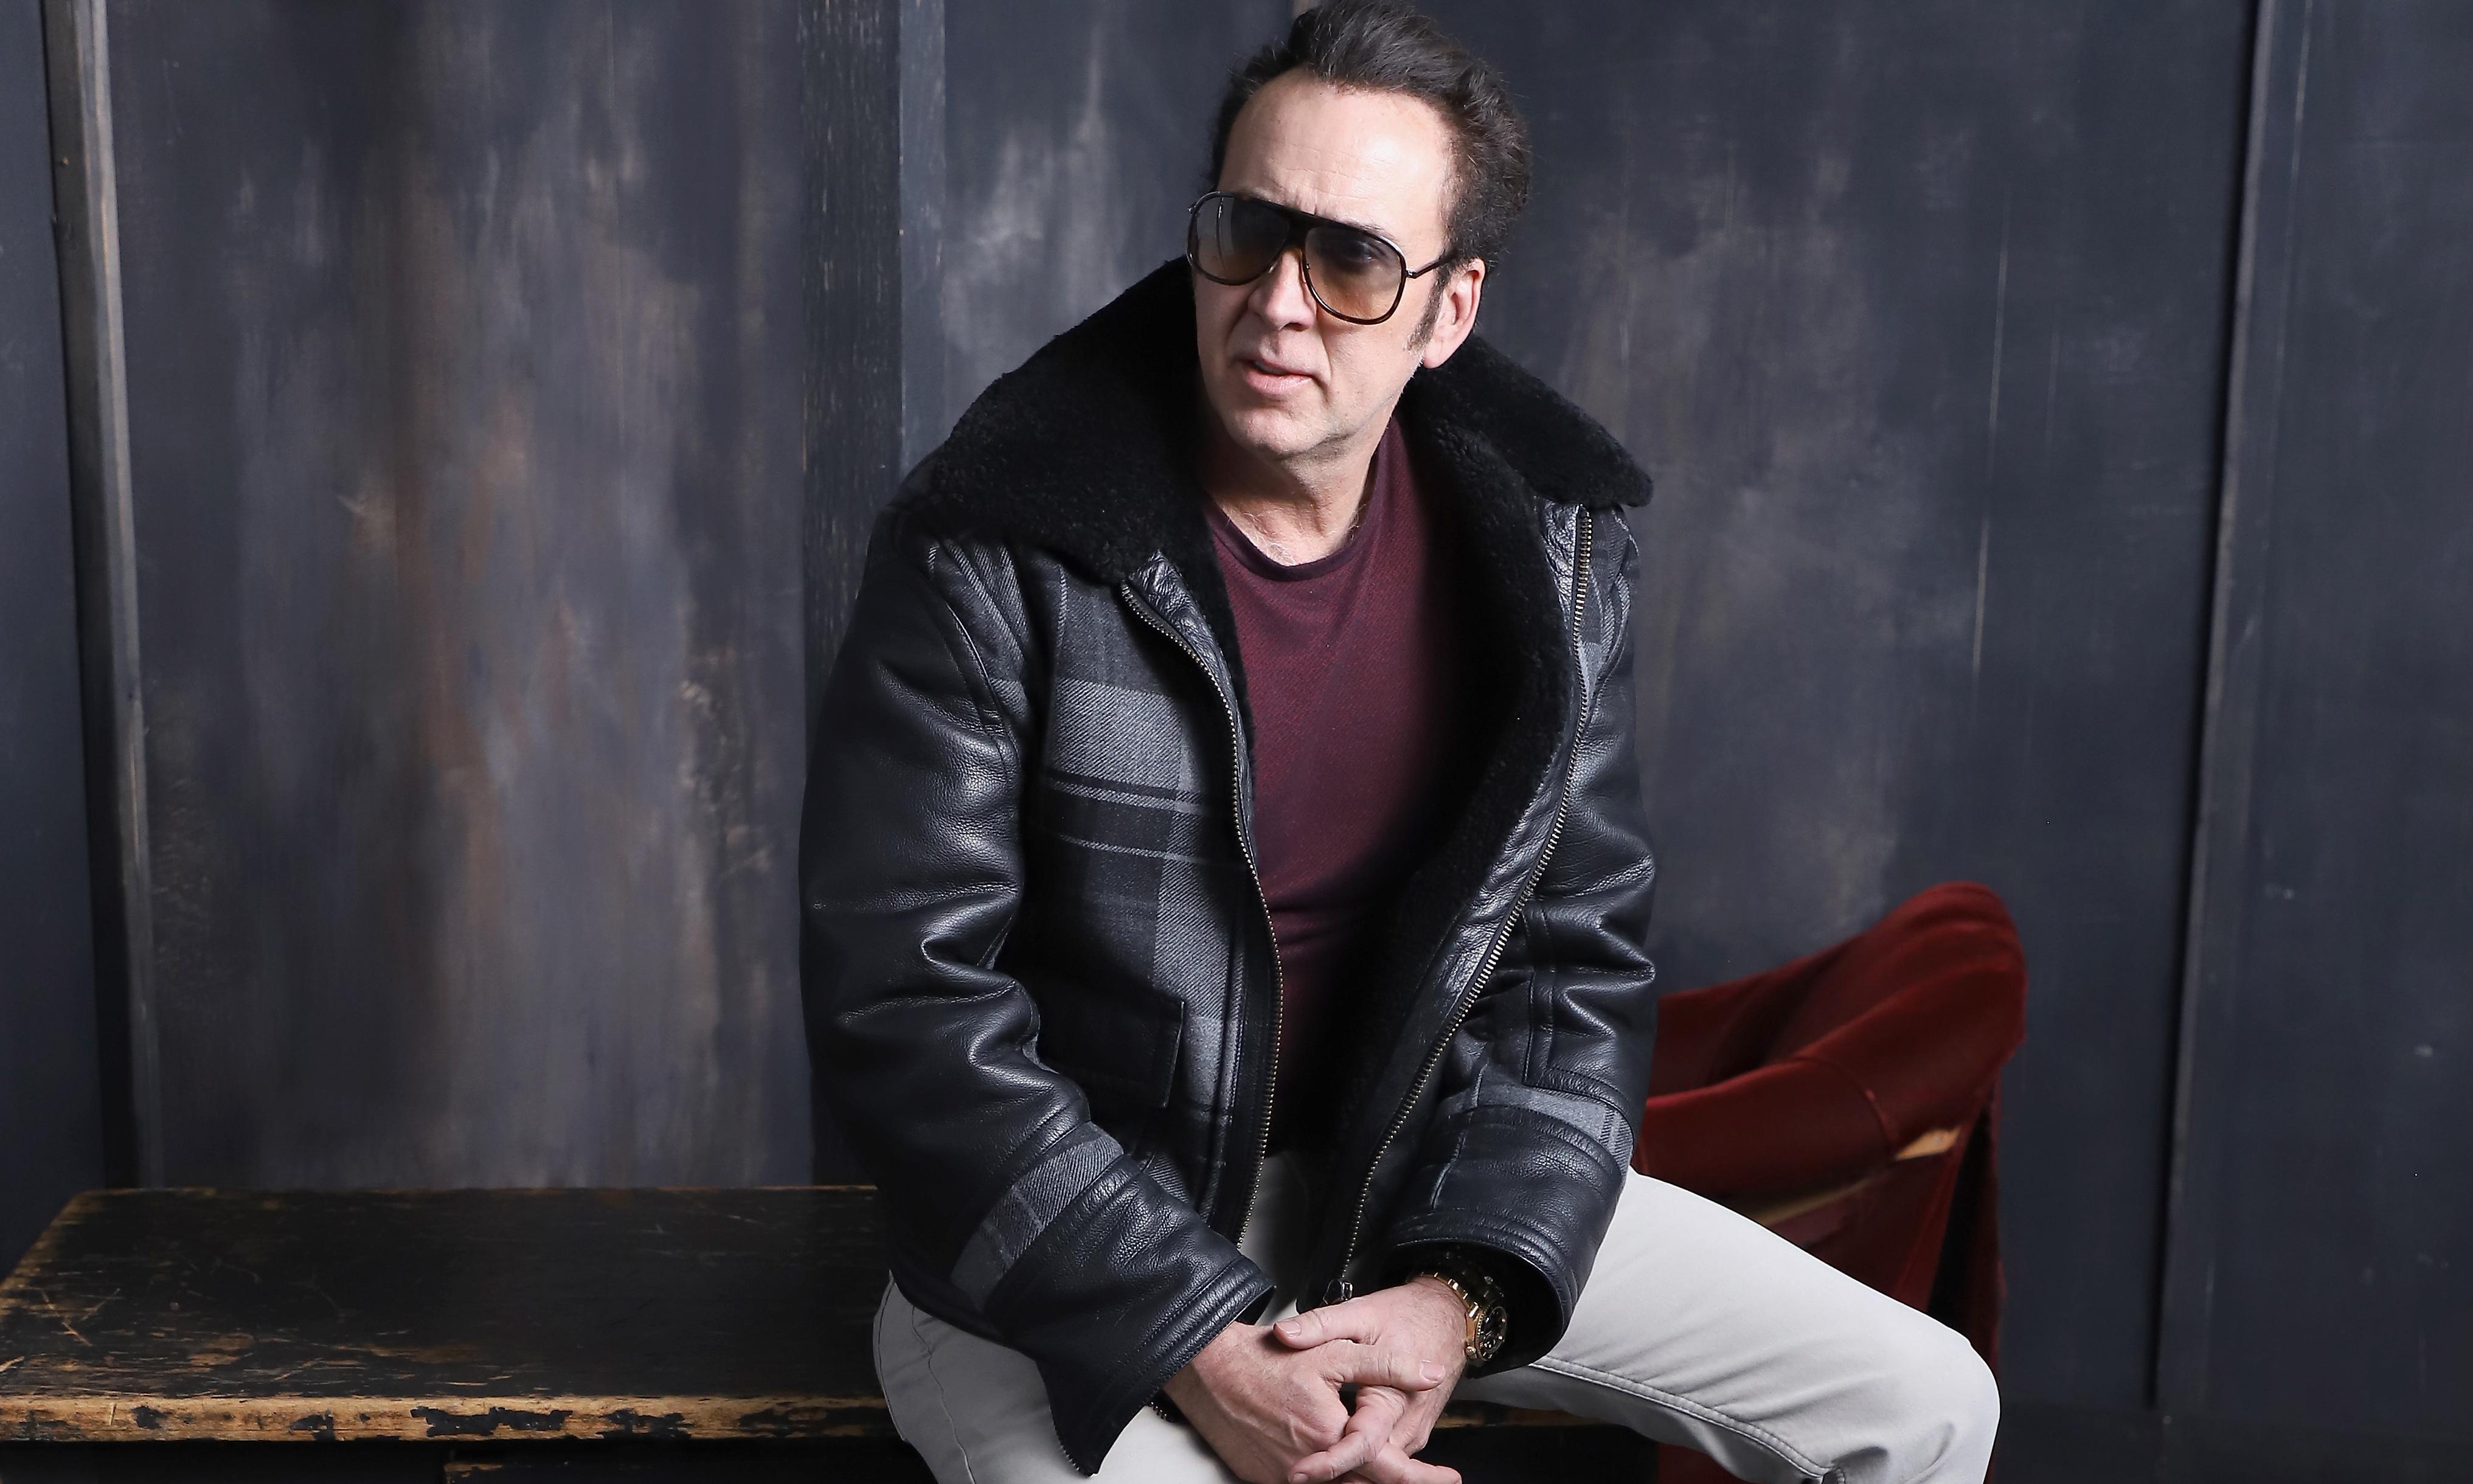 Nicolas Cage: 'If I don't have a job to do, I can be very self-destructive'